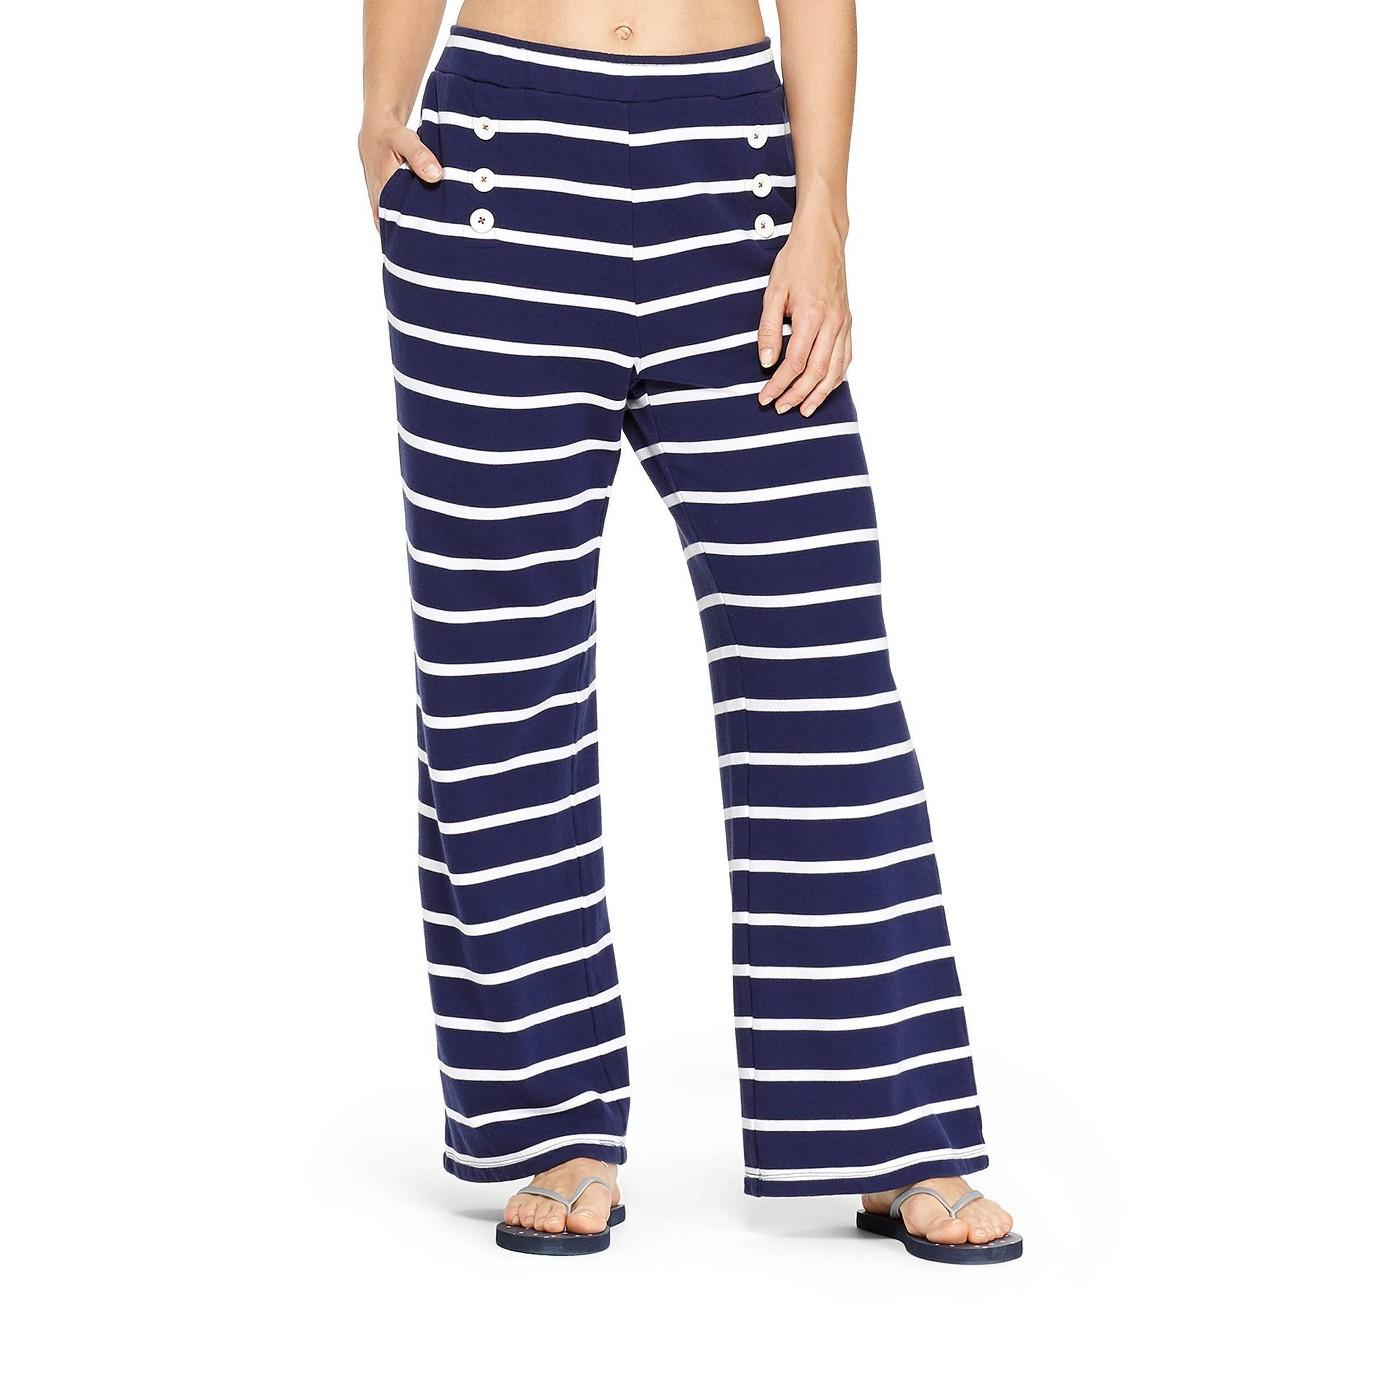 Women's Striped Pants - Navy/White - vineyard vines® for Target - image 1 of 5